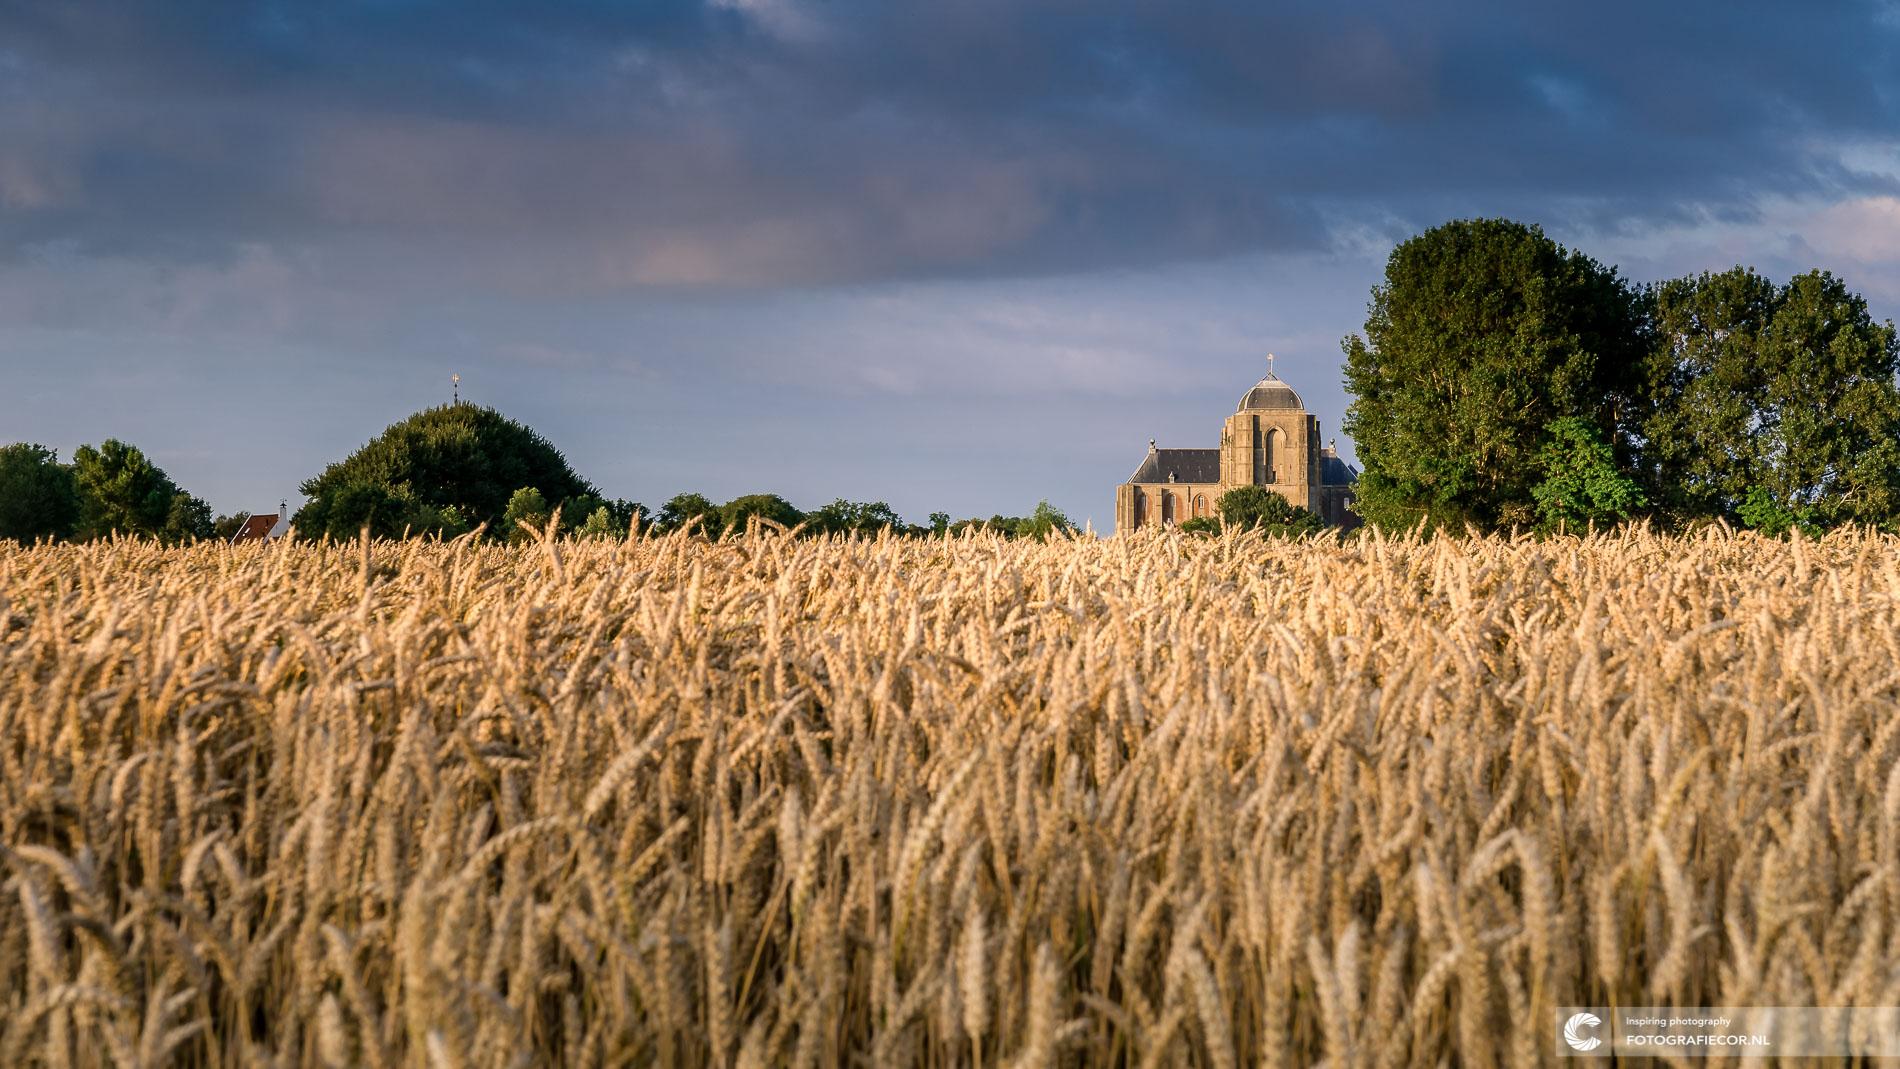 Zomeravond kerk Veere| korenvelden